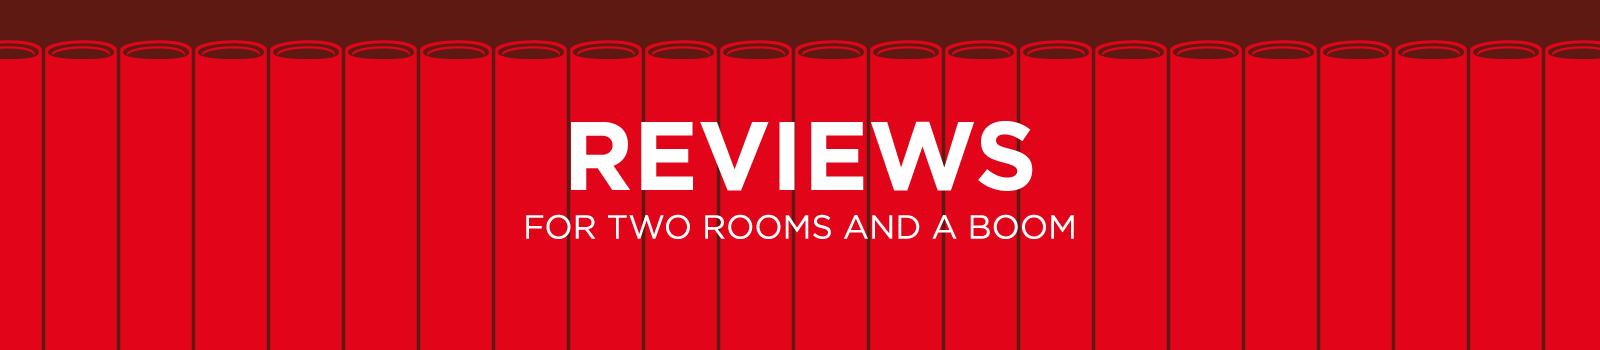 two-rooms-reviews-hero-long.png